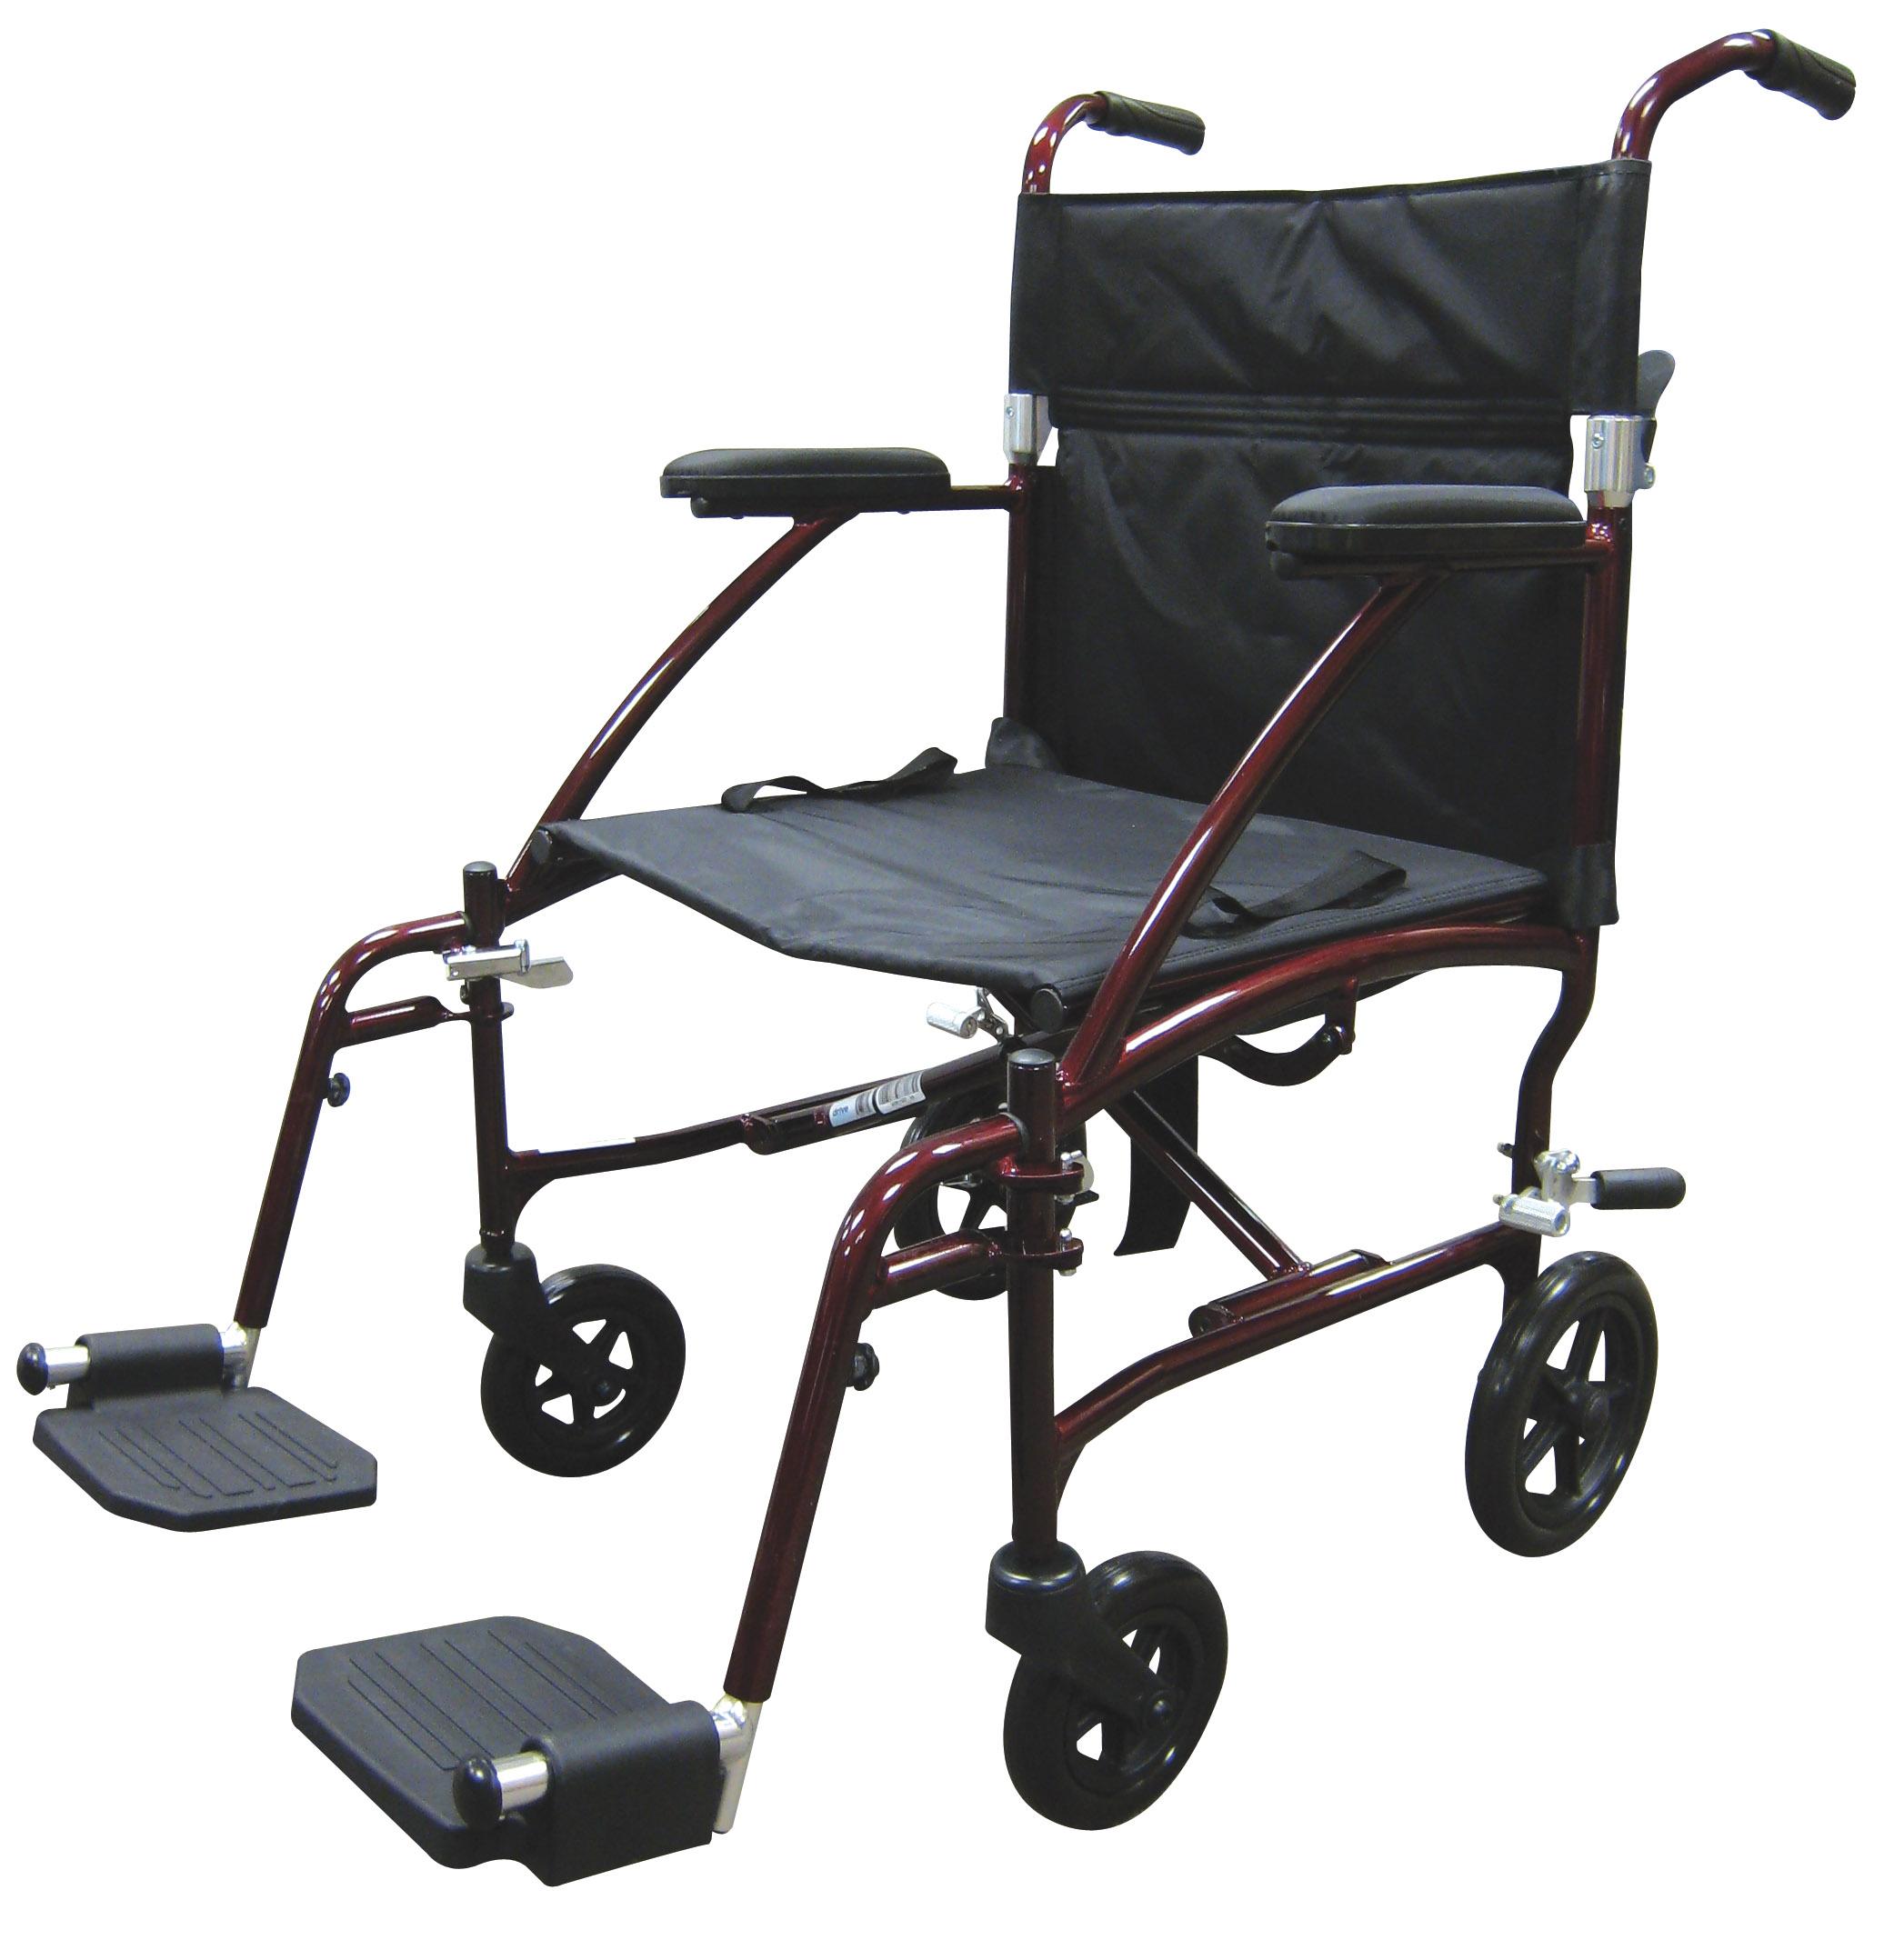 lightweight transport chair folding wooden camp chairs fly lite ultra wheelchair ideal